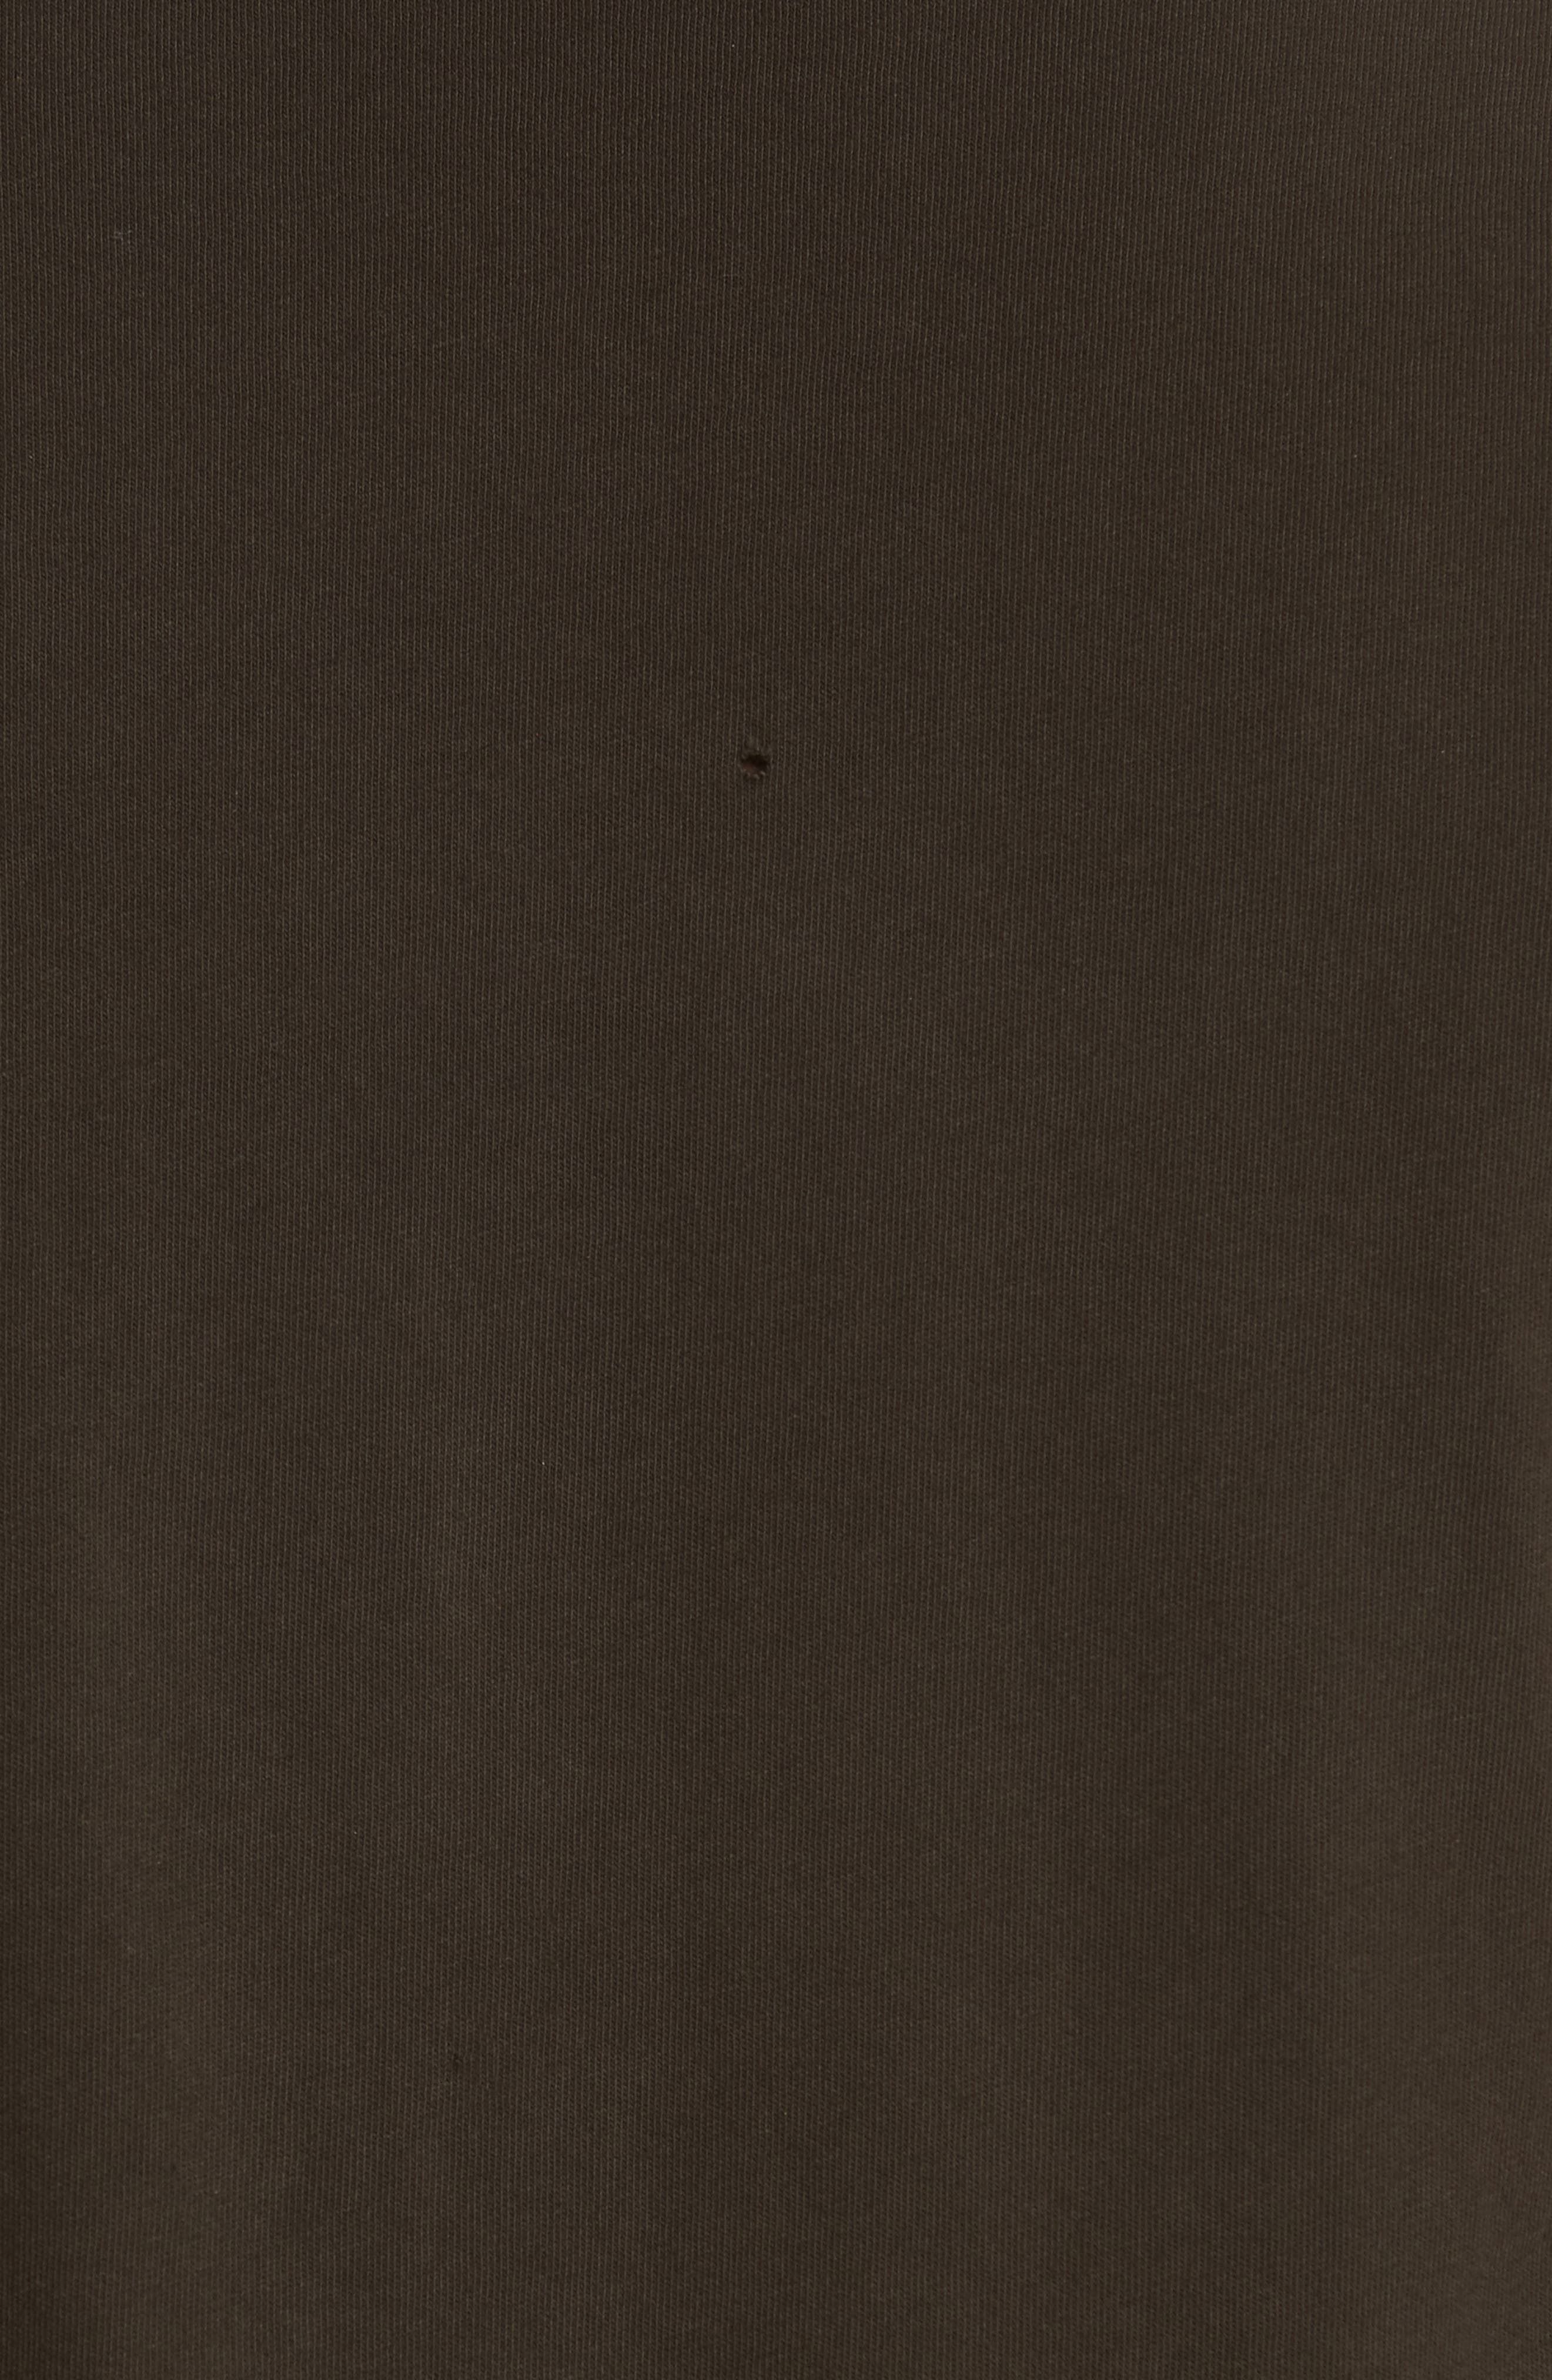 Ramones Graphic T-Shirt,                             Alternate thumbnail 5, color,                             001